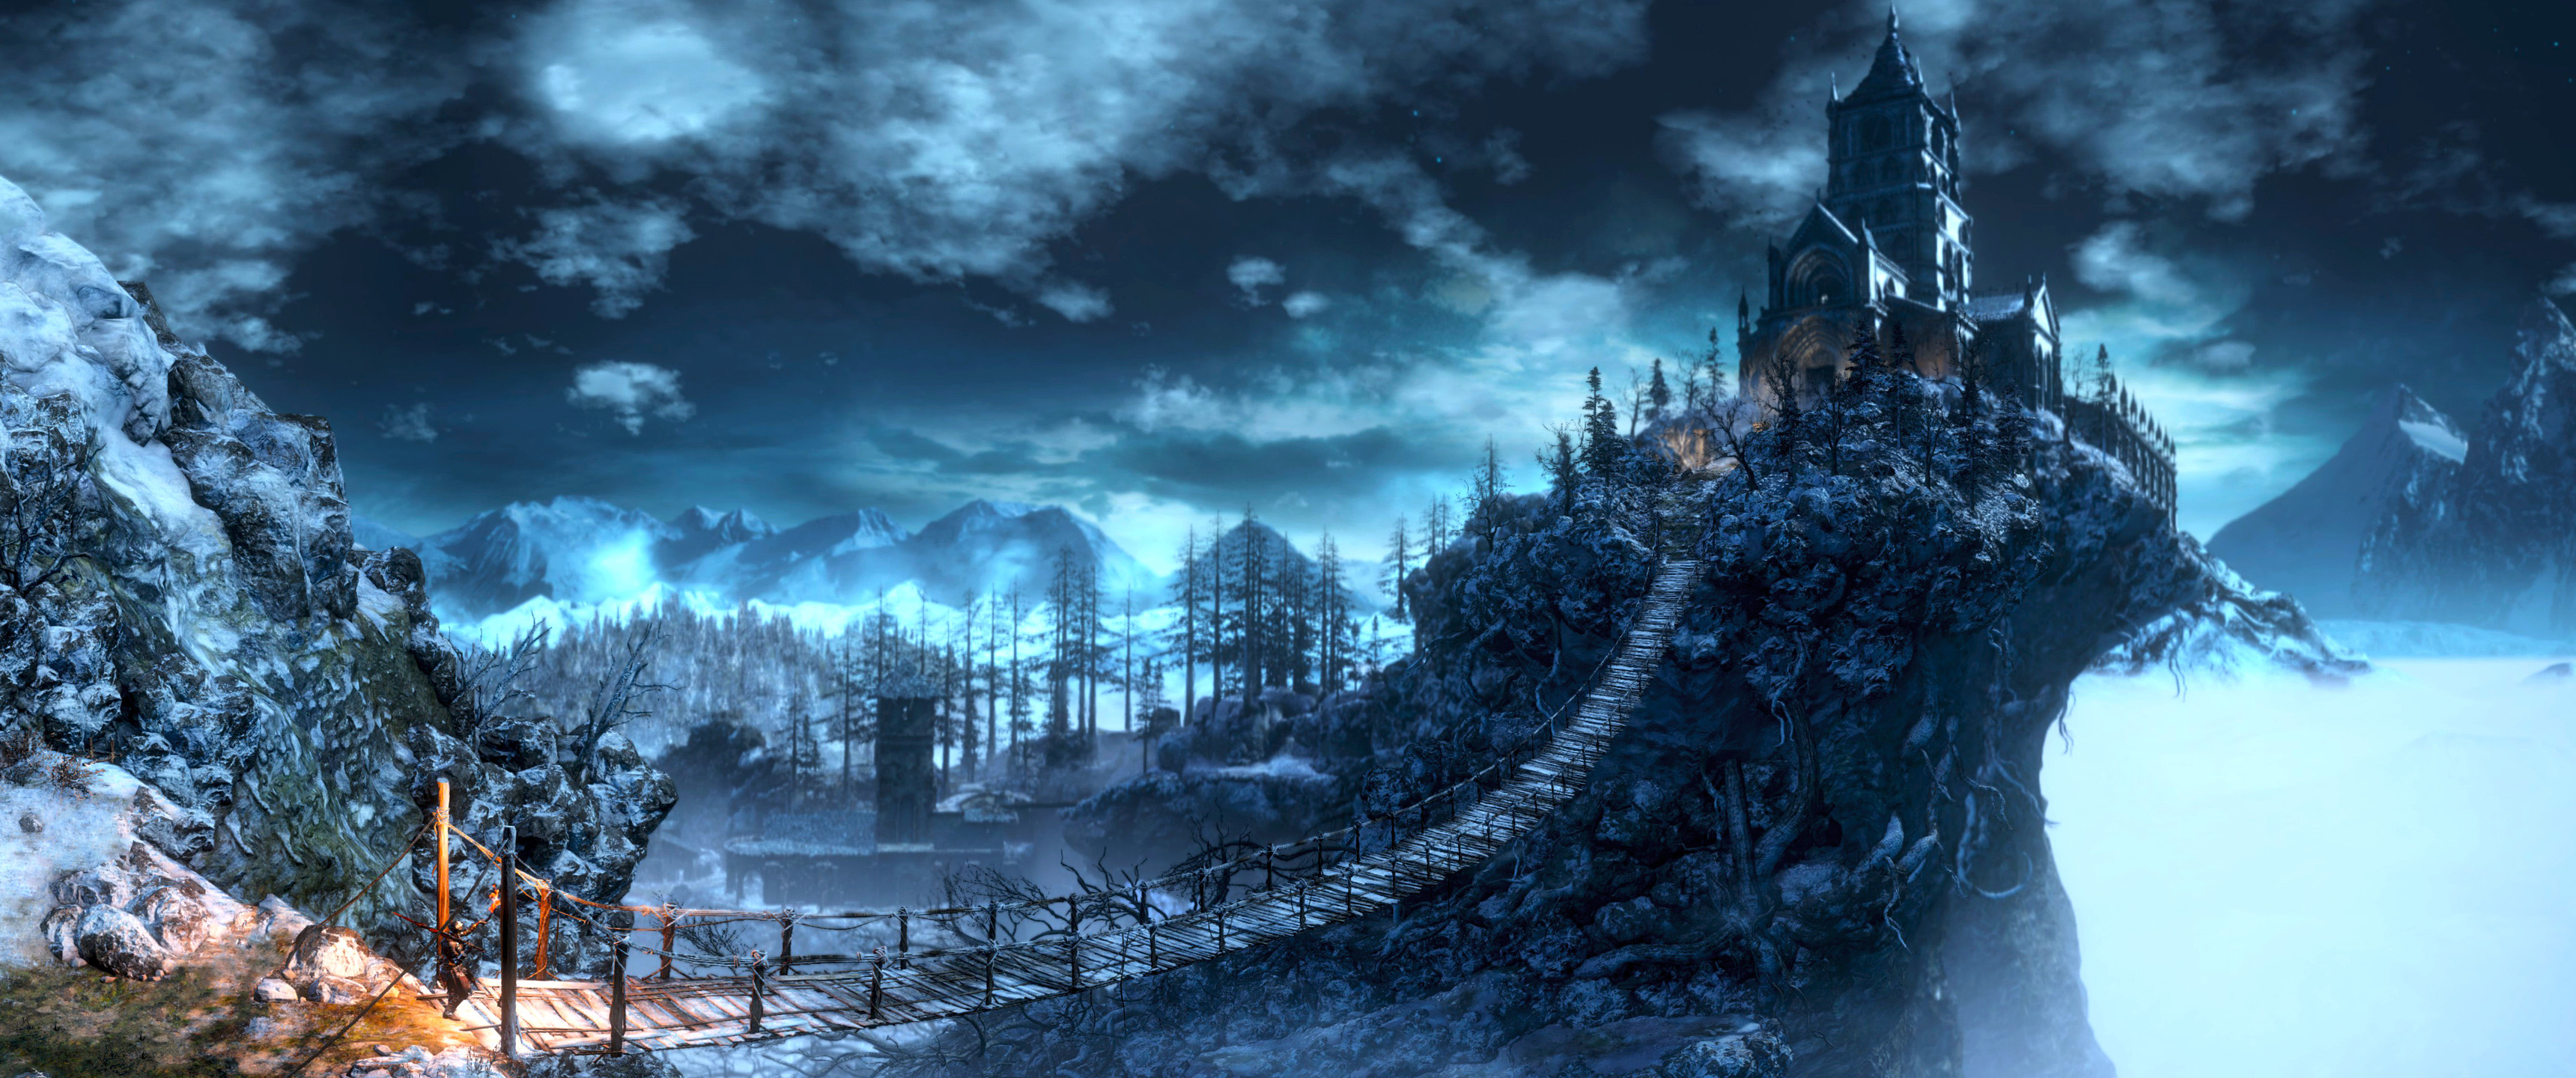 Dark Souls 2 Wallpapers Hd Download: Dark Souls HD Wallpapers (69+ Images